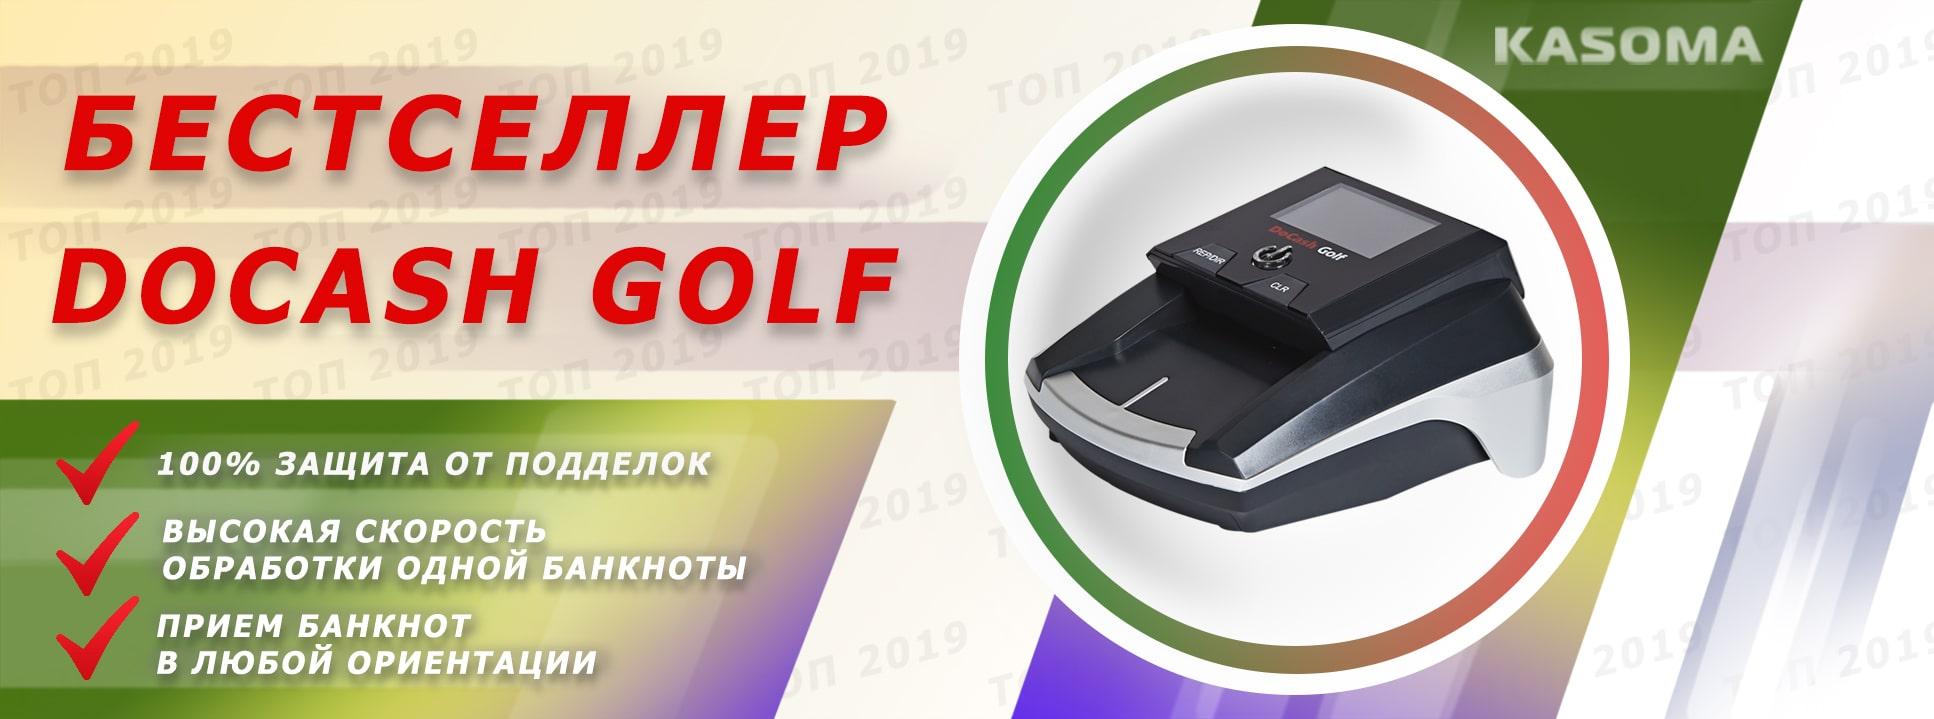 Docash Golf